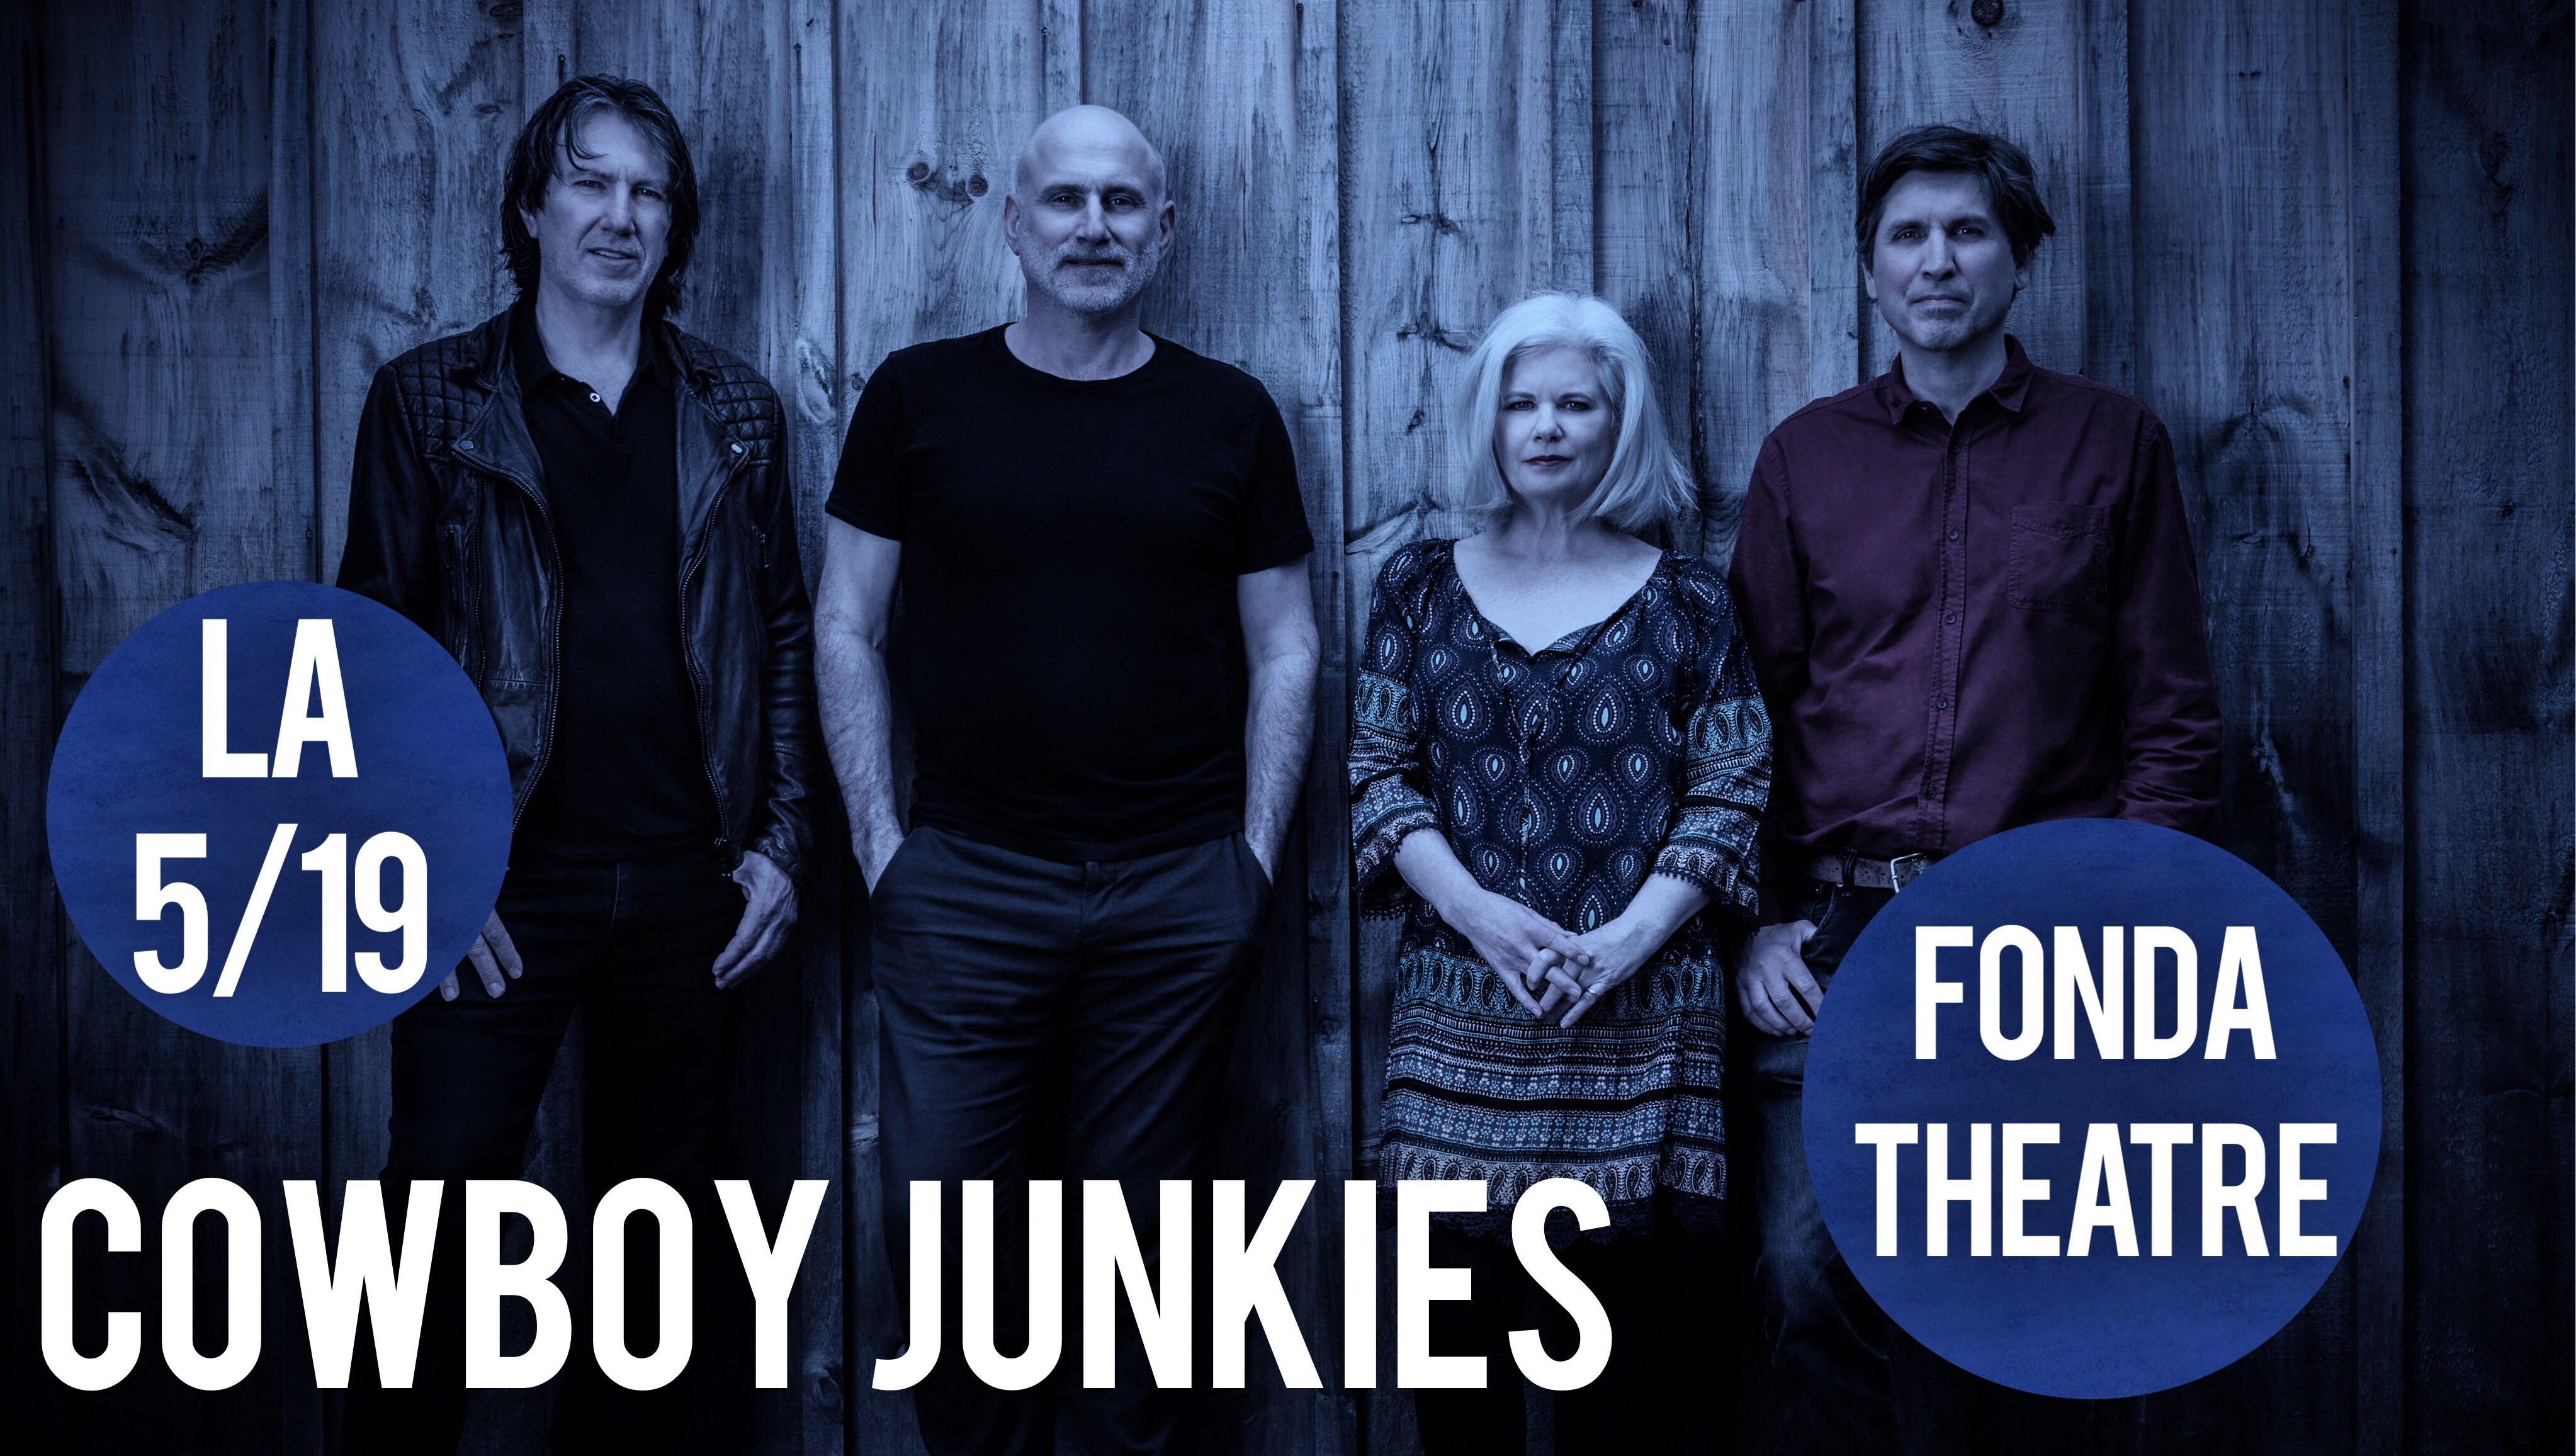 GIVEAWAY: Win tickets to Cowboy Junkies at Fonda Theatre (LA) 5/19